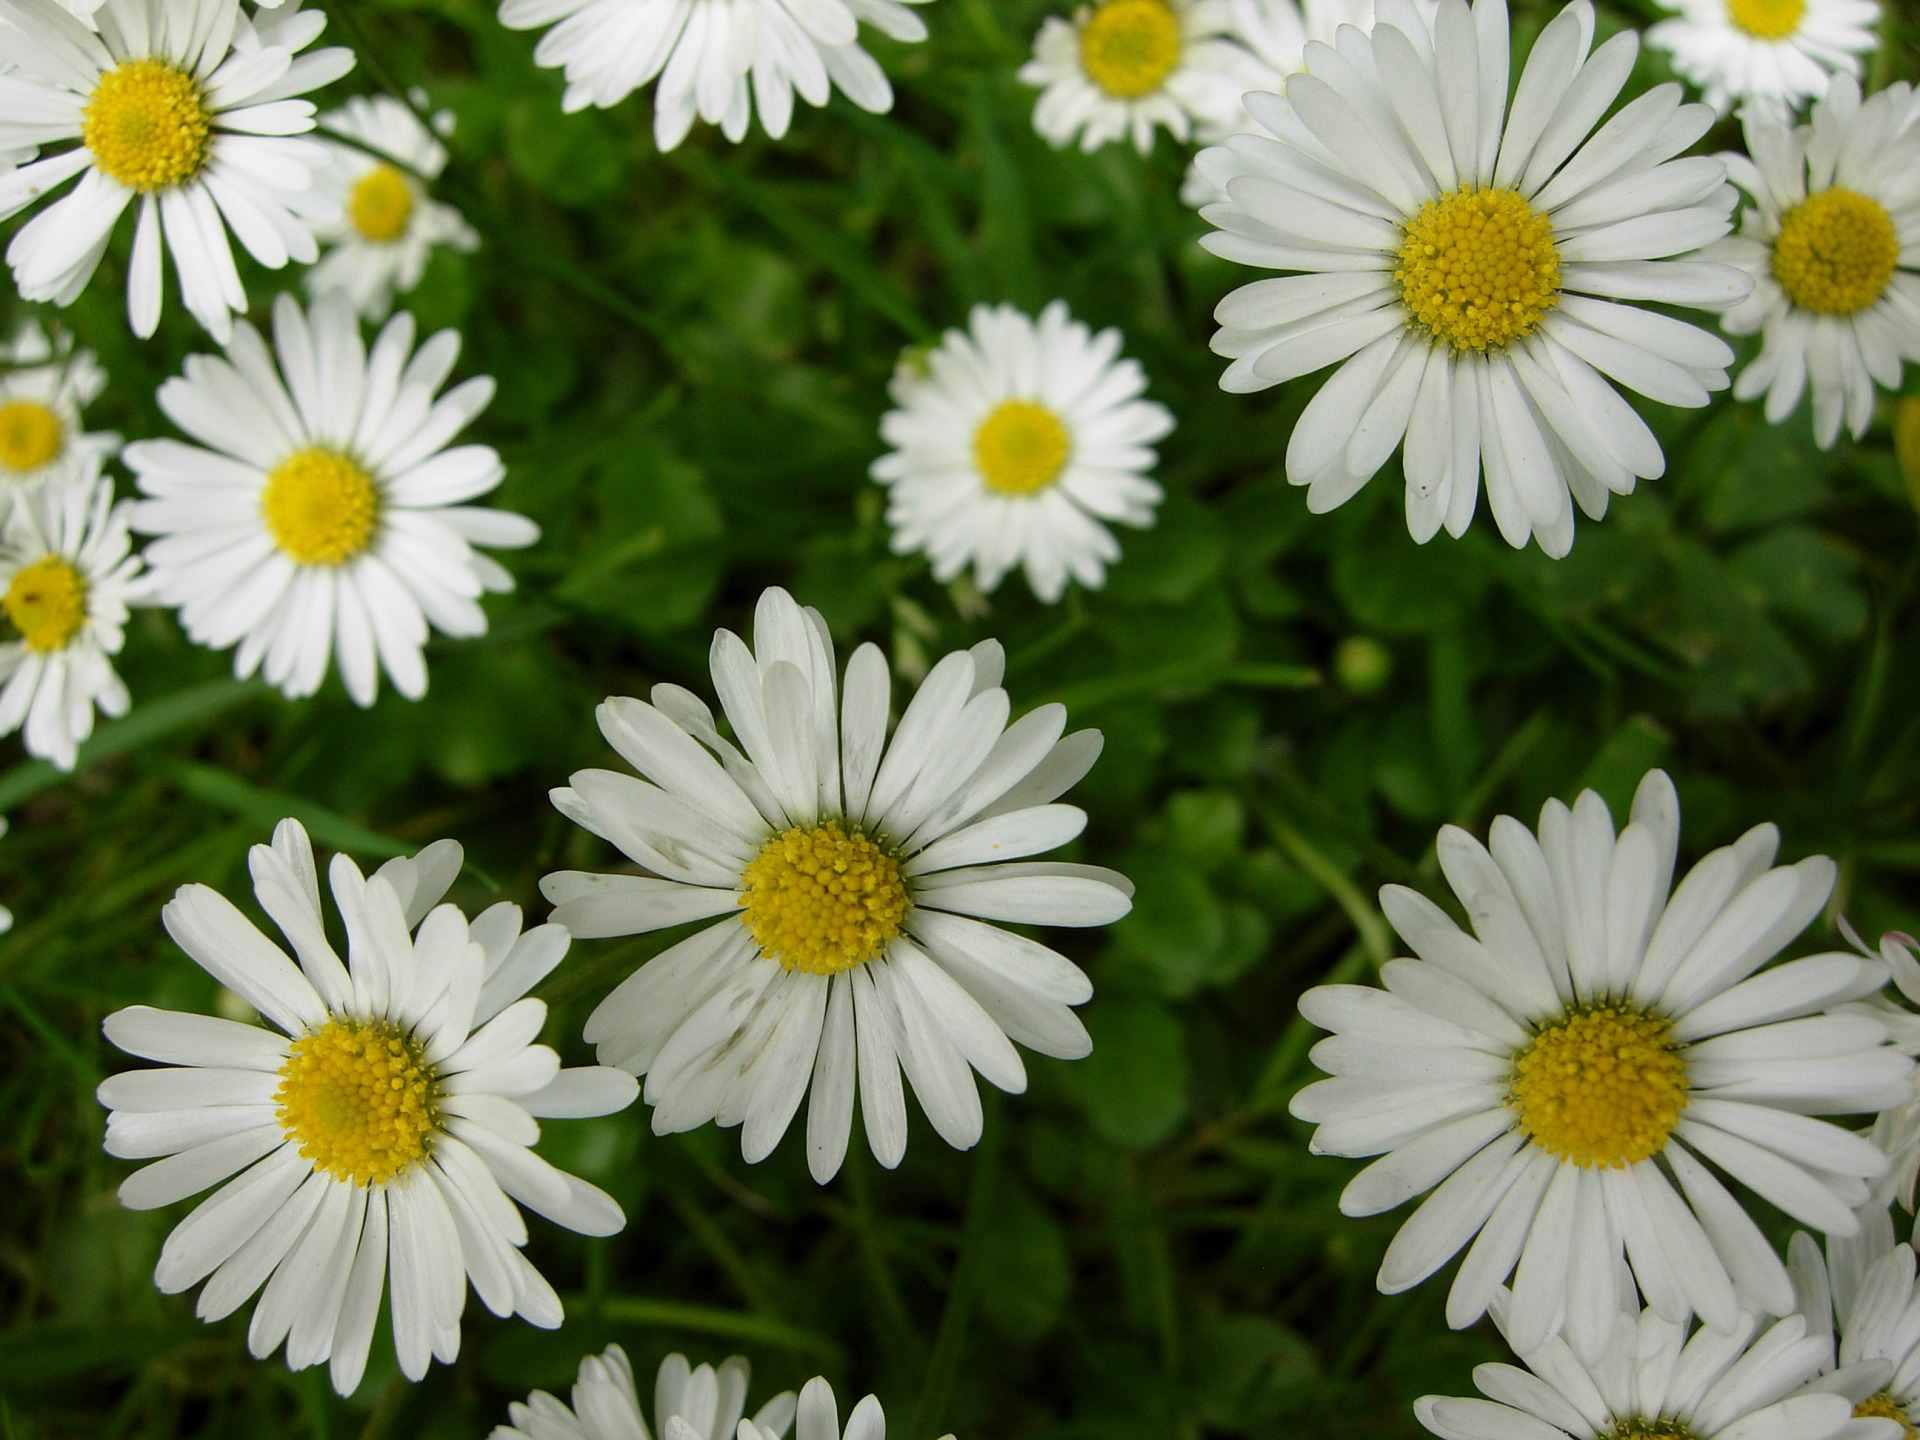 About a dozen white English daisy blooms.